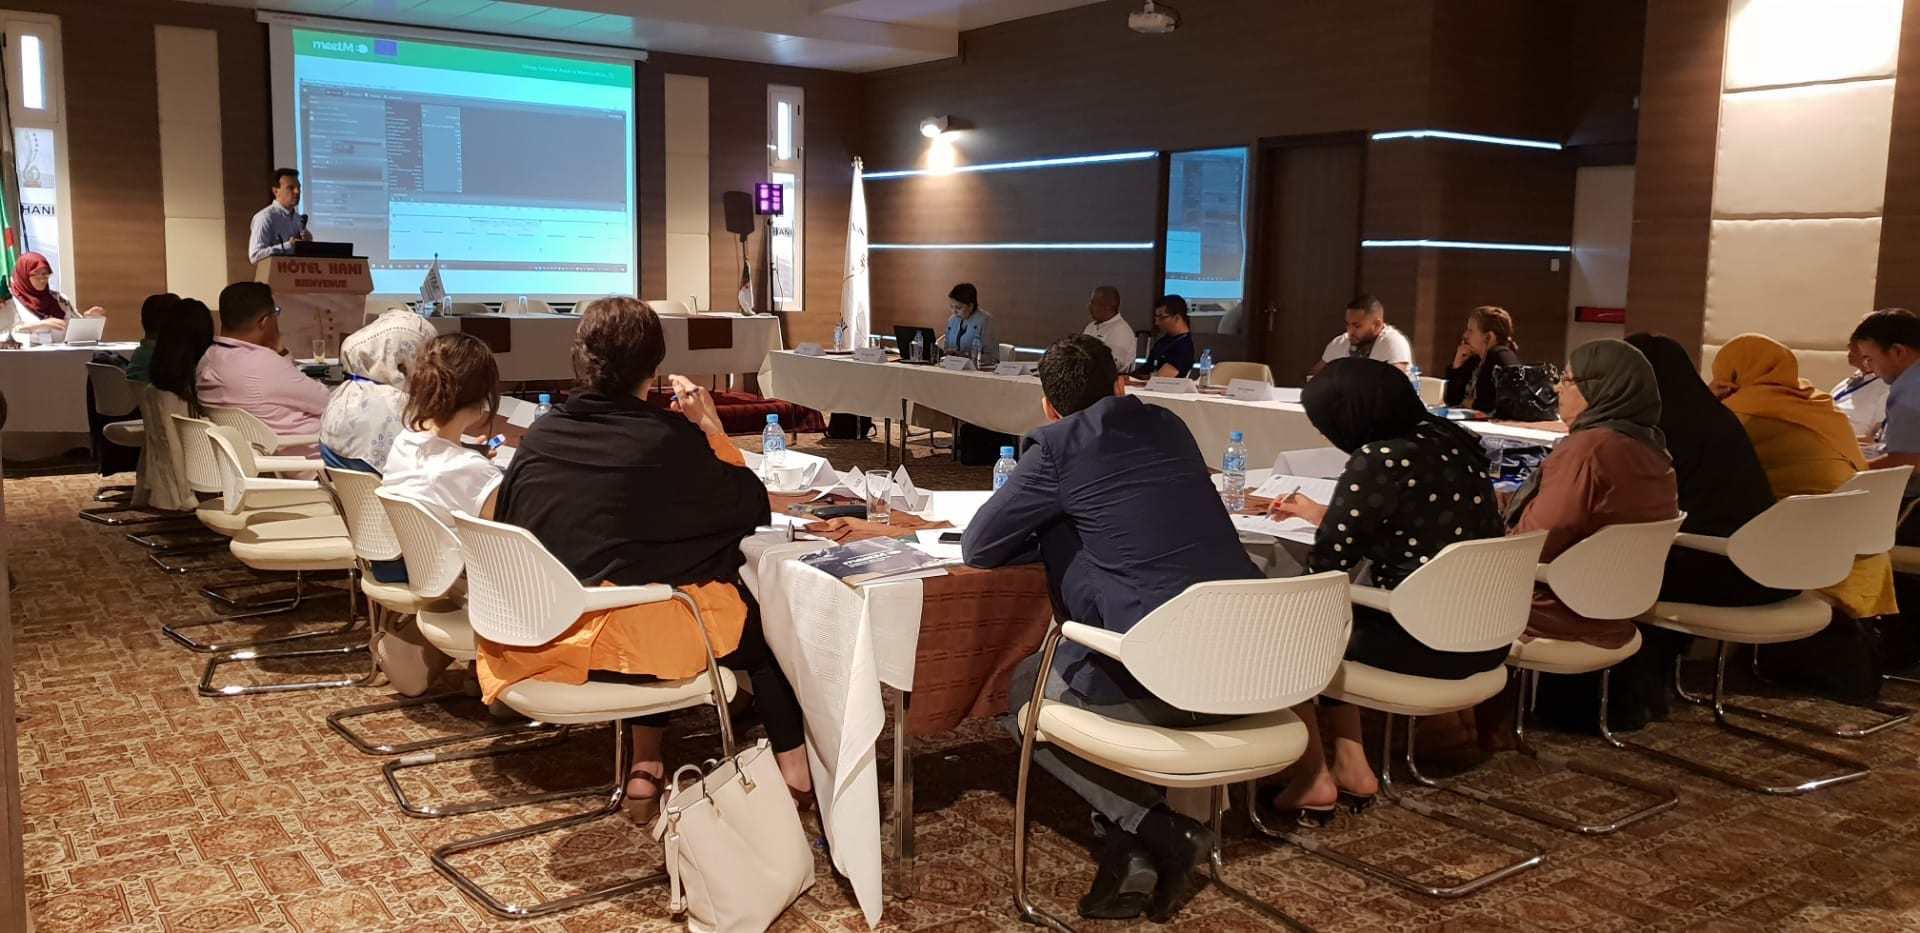 meetMED Training on Energy Efficiency and Renewable Energy Sources in Buildings